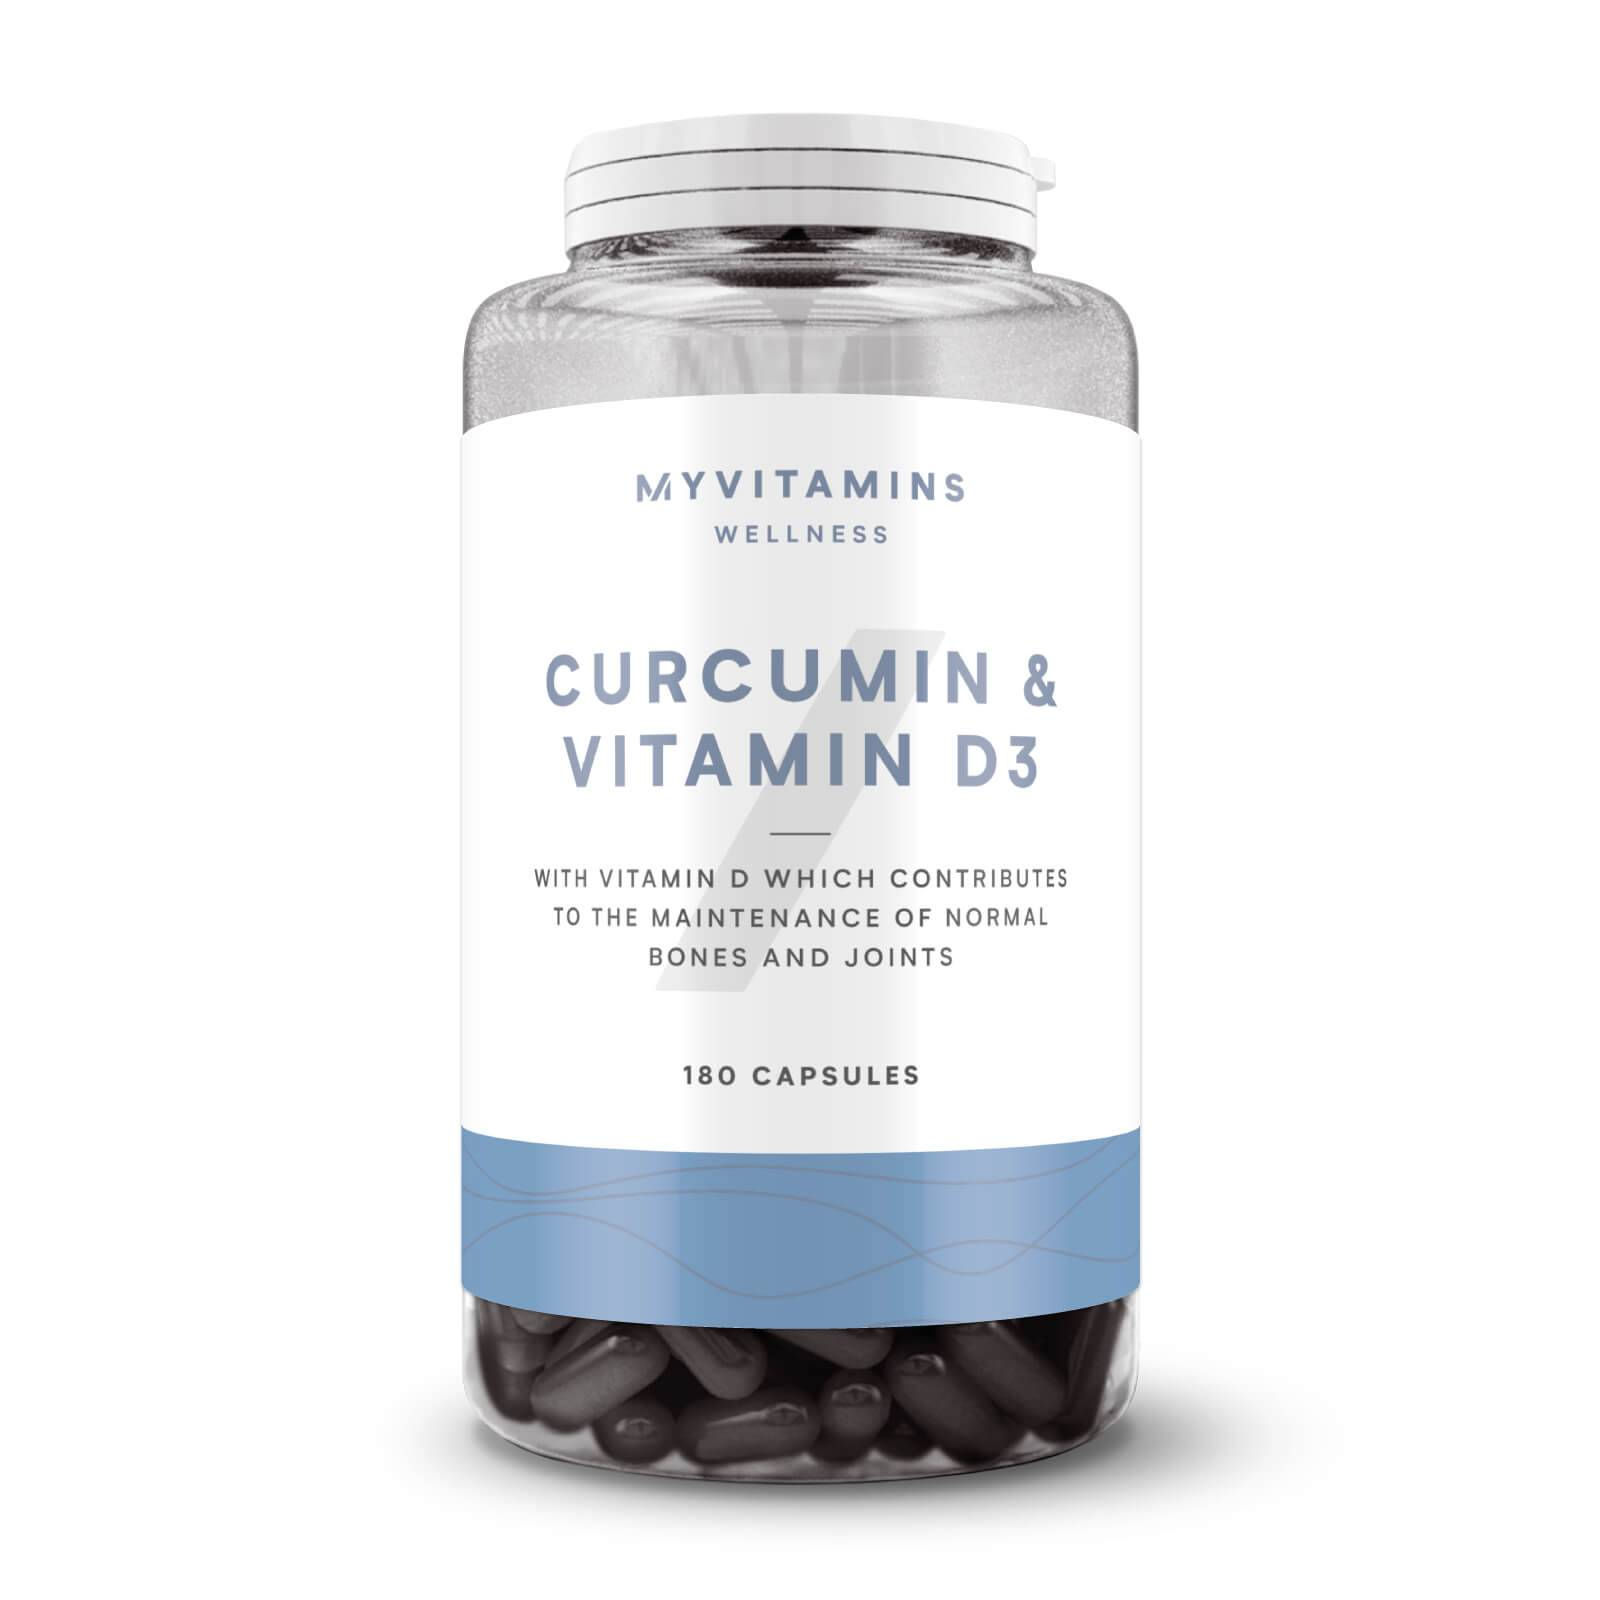 Myvitamins Gélules de Curcumine et Vitamine D - 60Gélules